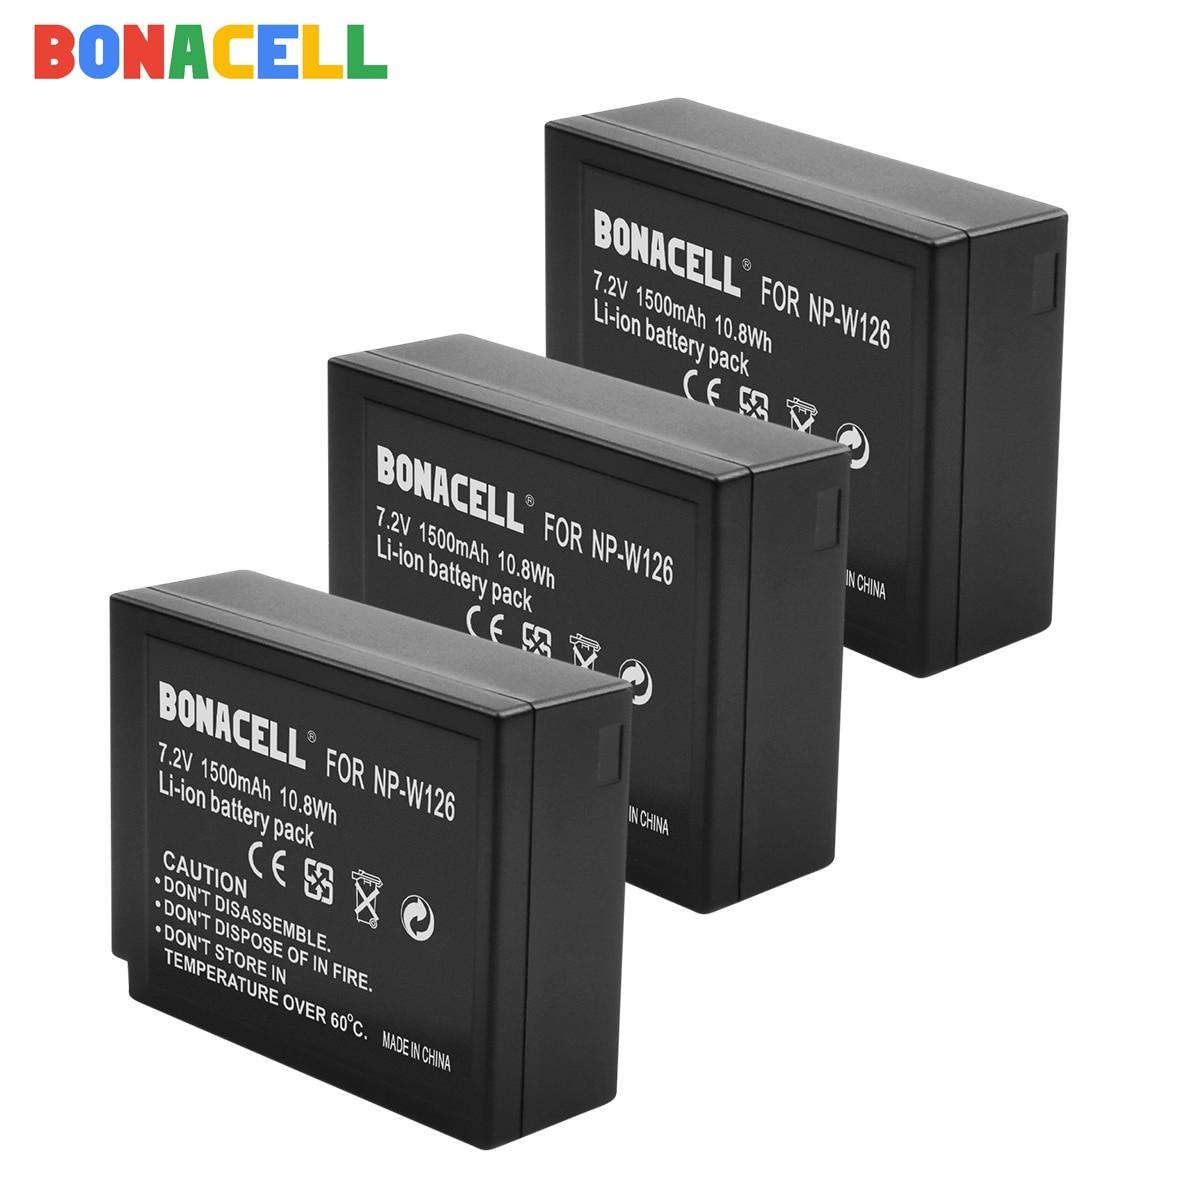 Bateria para Fujifilm X-M1 X-A1 Bonacell Para Fujifilm NP-W126 NP-W126S X-T1 X-E1 X-Pro2 NP W126